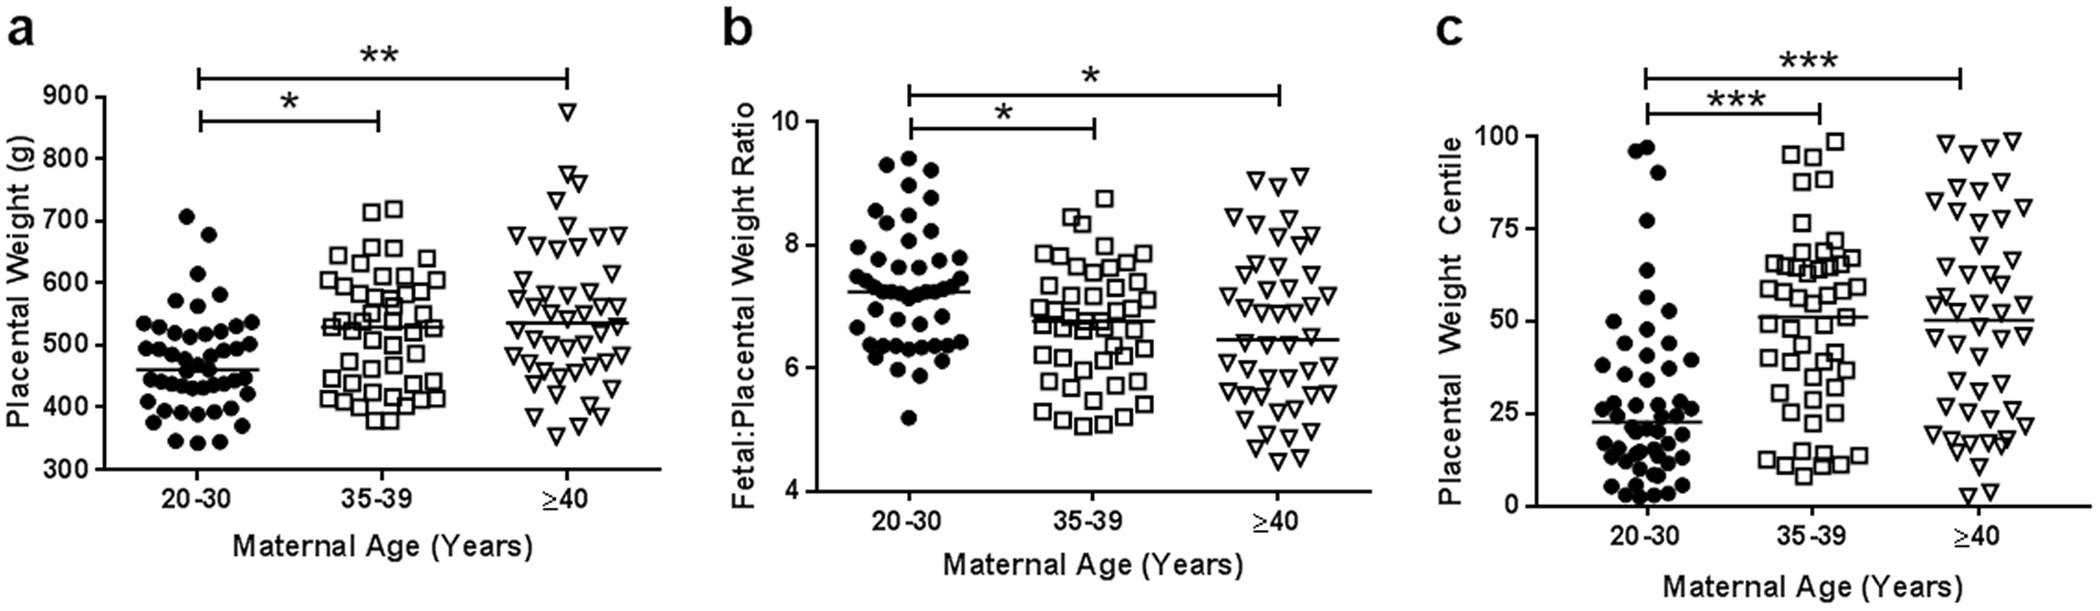 Placental Dysfunction Underlies Increased Risk of Fetal